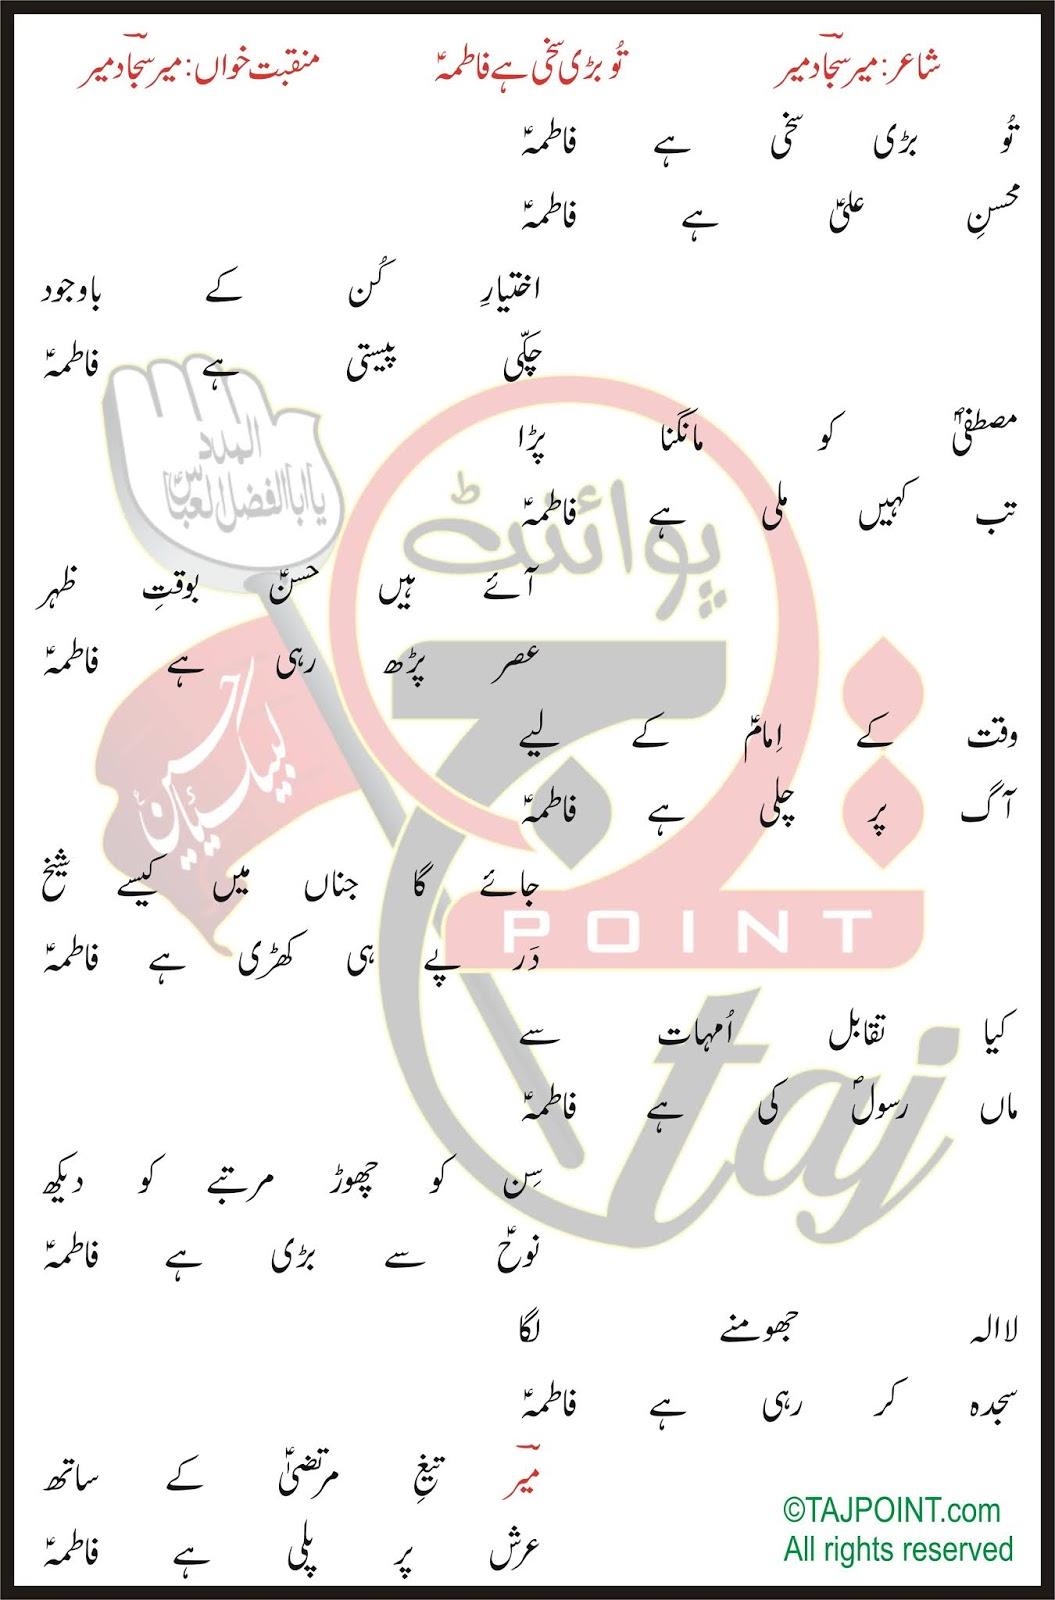 Sokhi lyrics